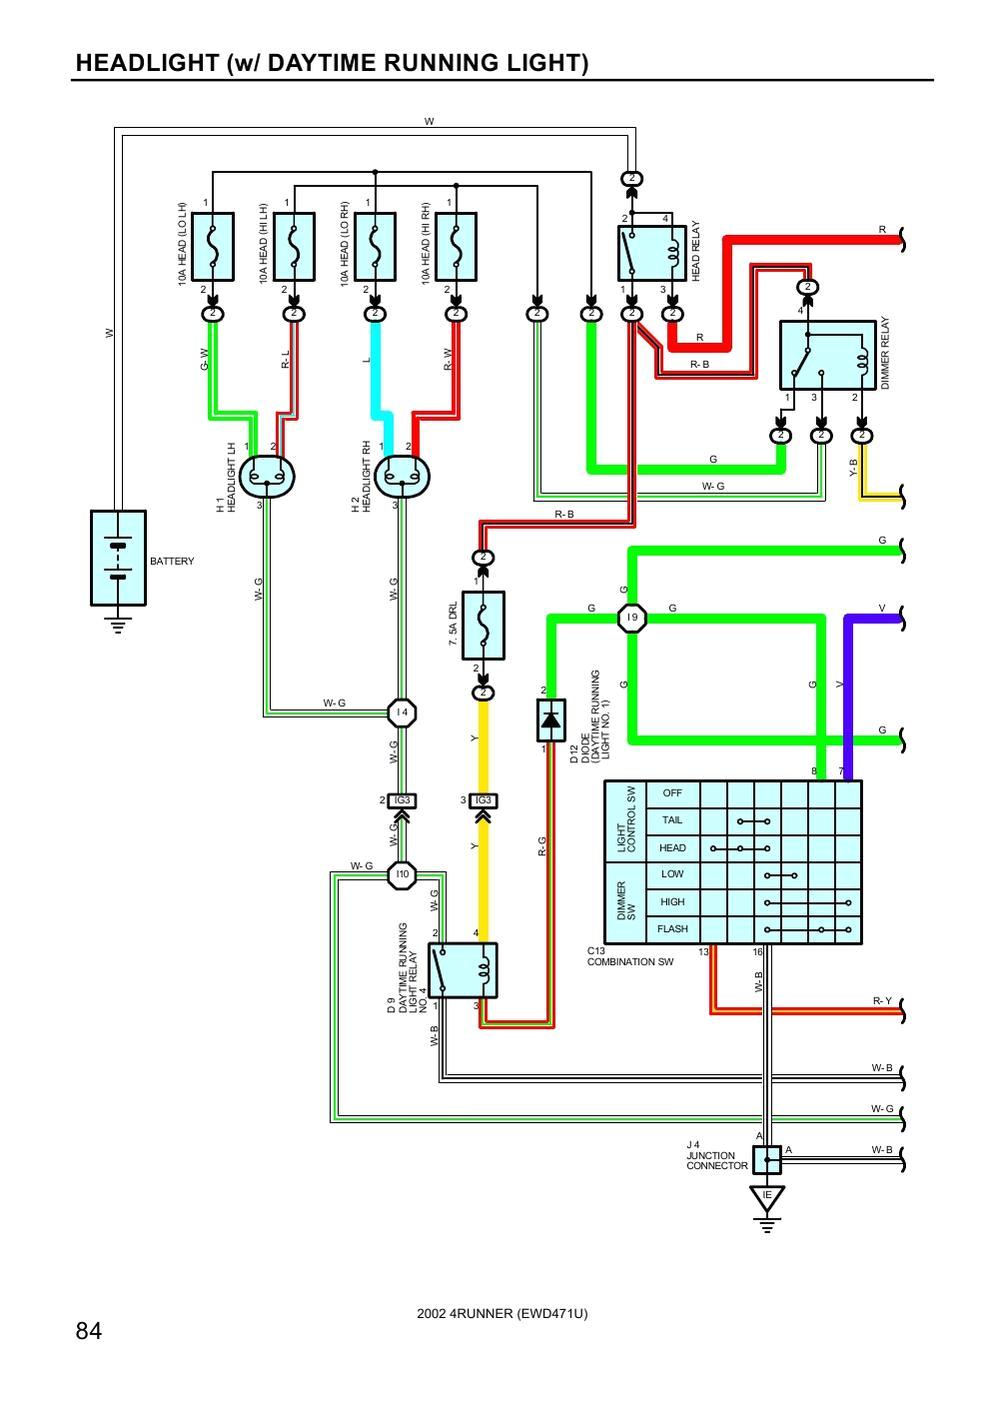 wiring diagram further toyota ta a fog lights on 1996 toyota corolla toyota yaris lights wiring diagram toyota lights wiring diagram